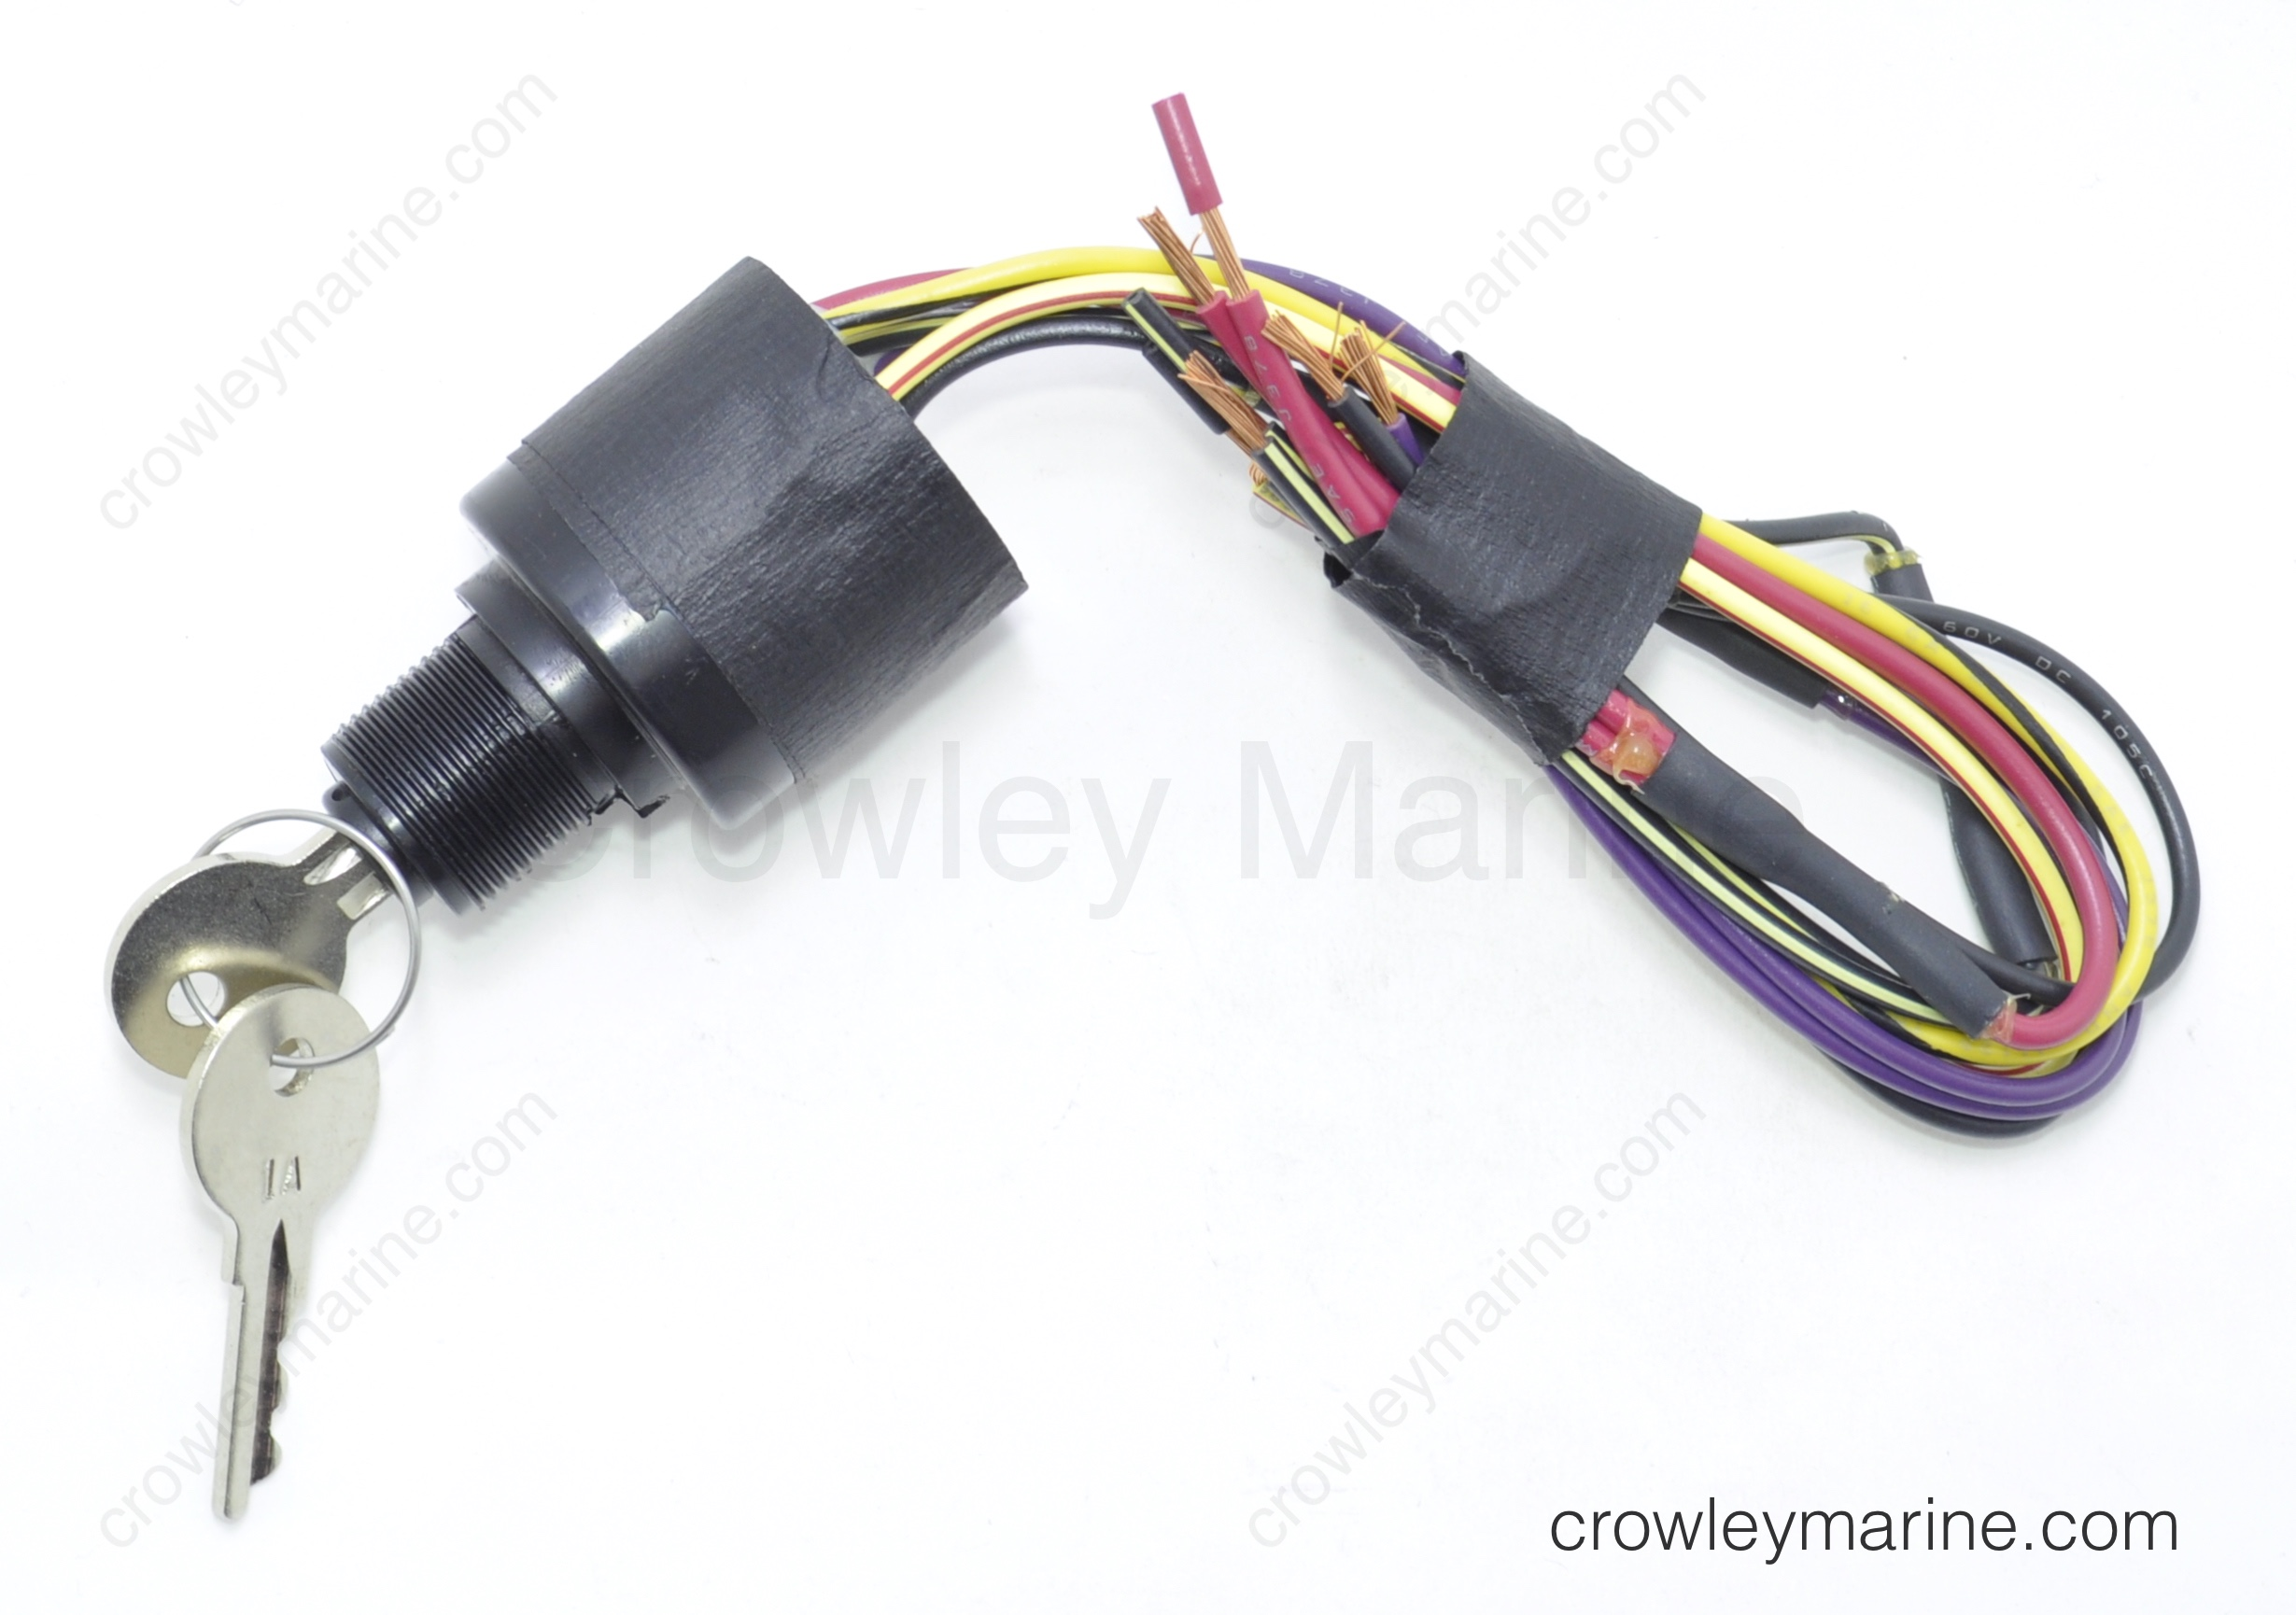 88107a5 Ignition Switch With Key Mercury Marine Crowley Marine